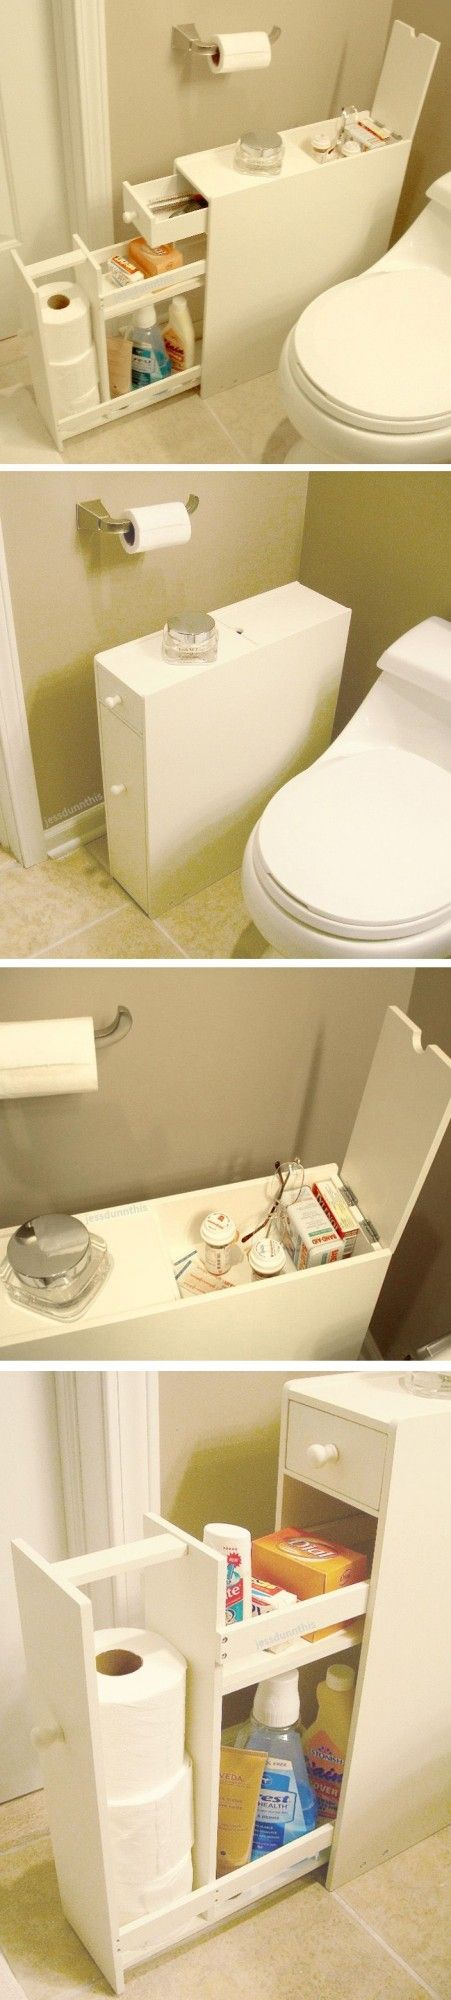 Top 25 The Best Diy Small Bathroom Storage Ideas That Will Amusing Bathroom Storage For Small Spaces Design Inspiration